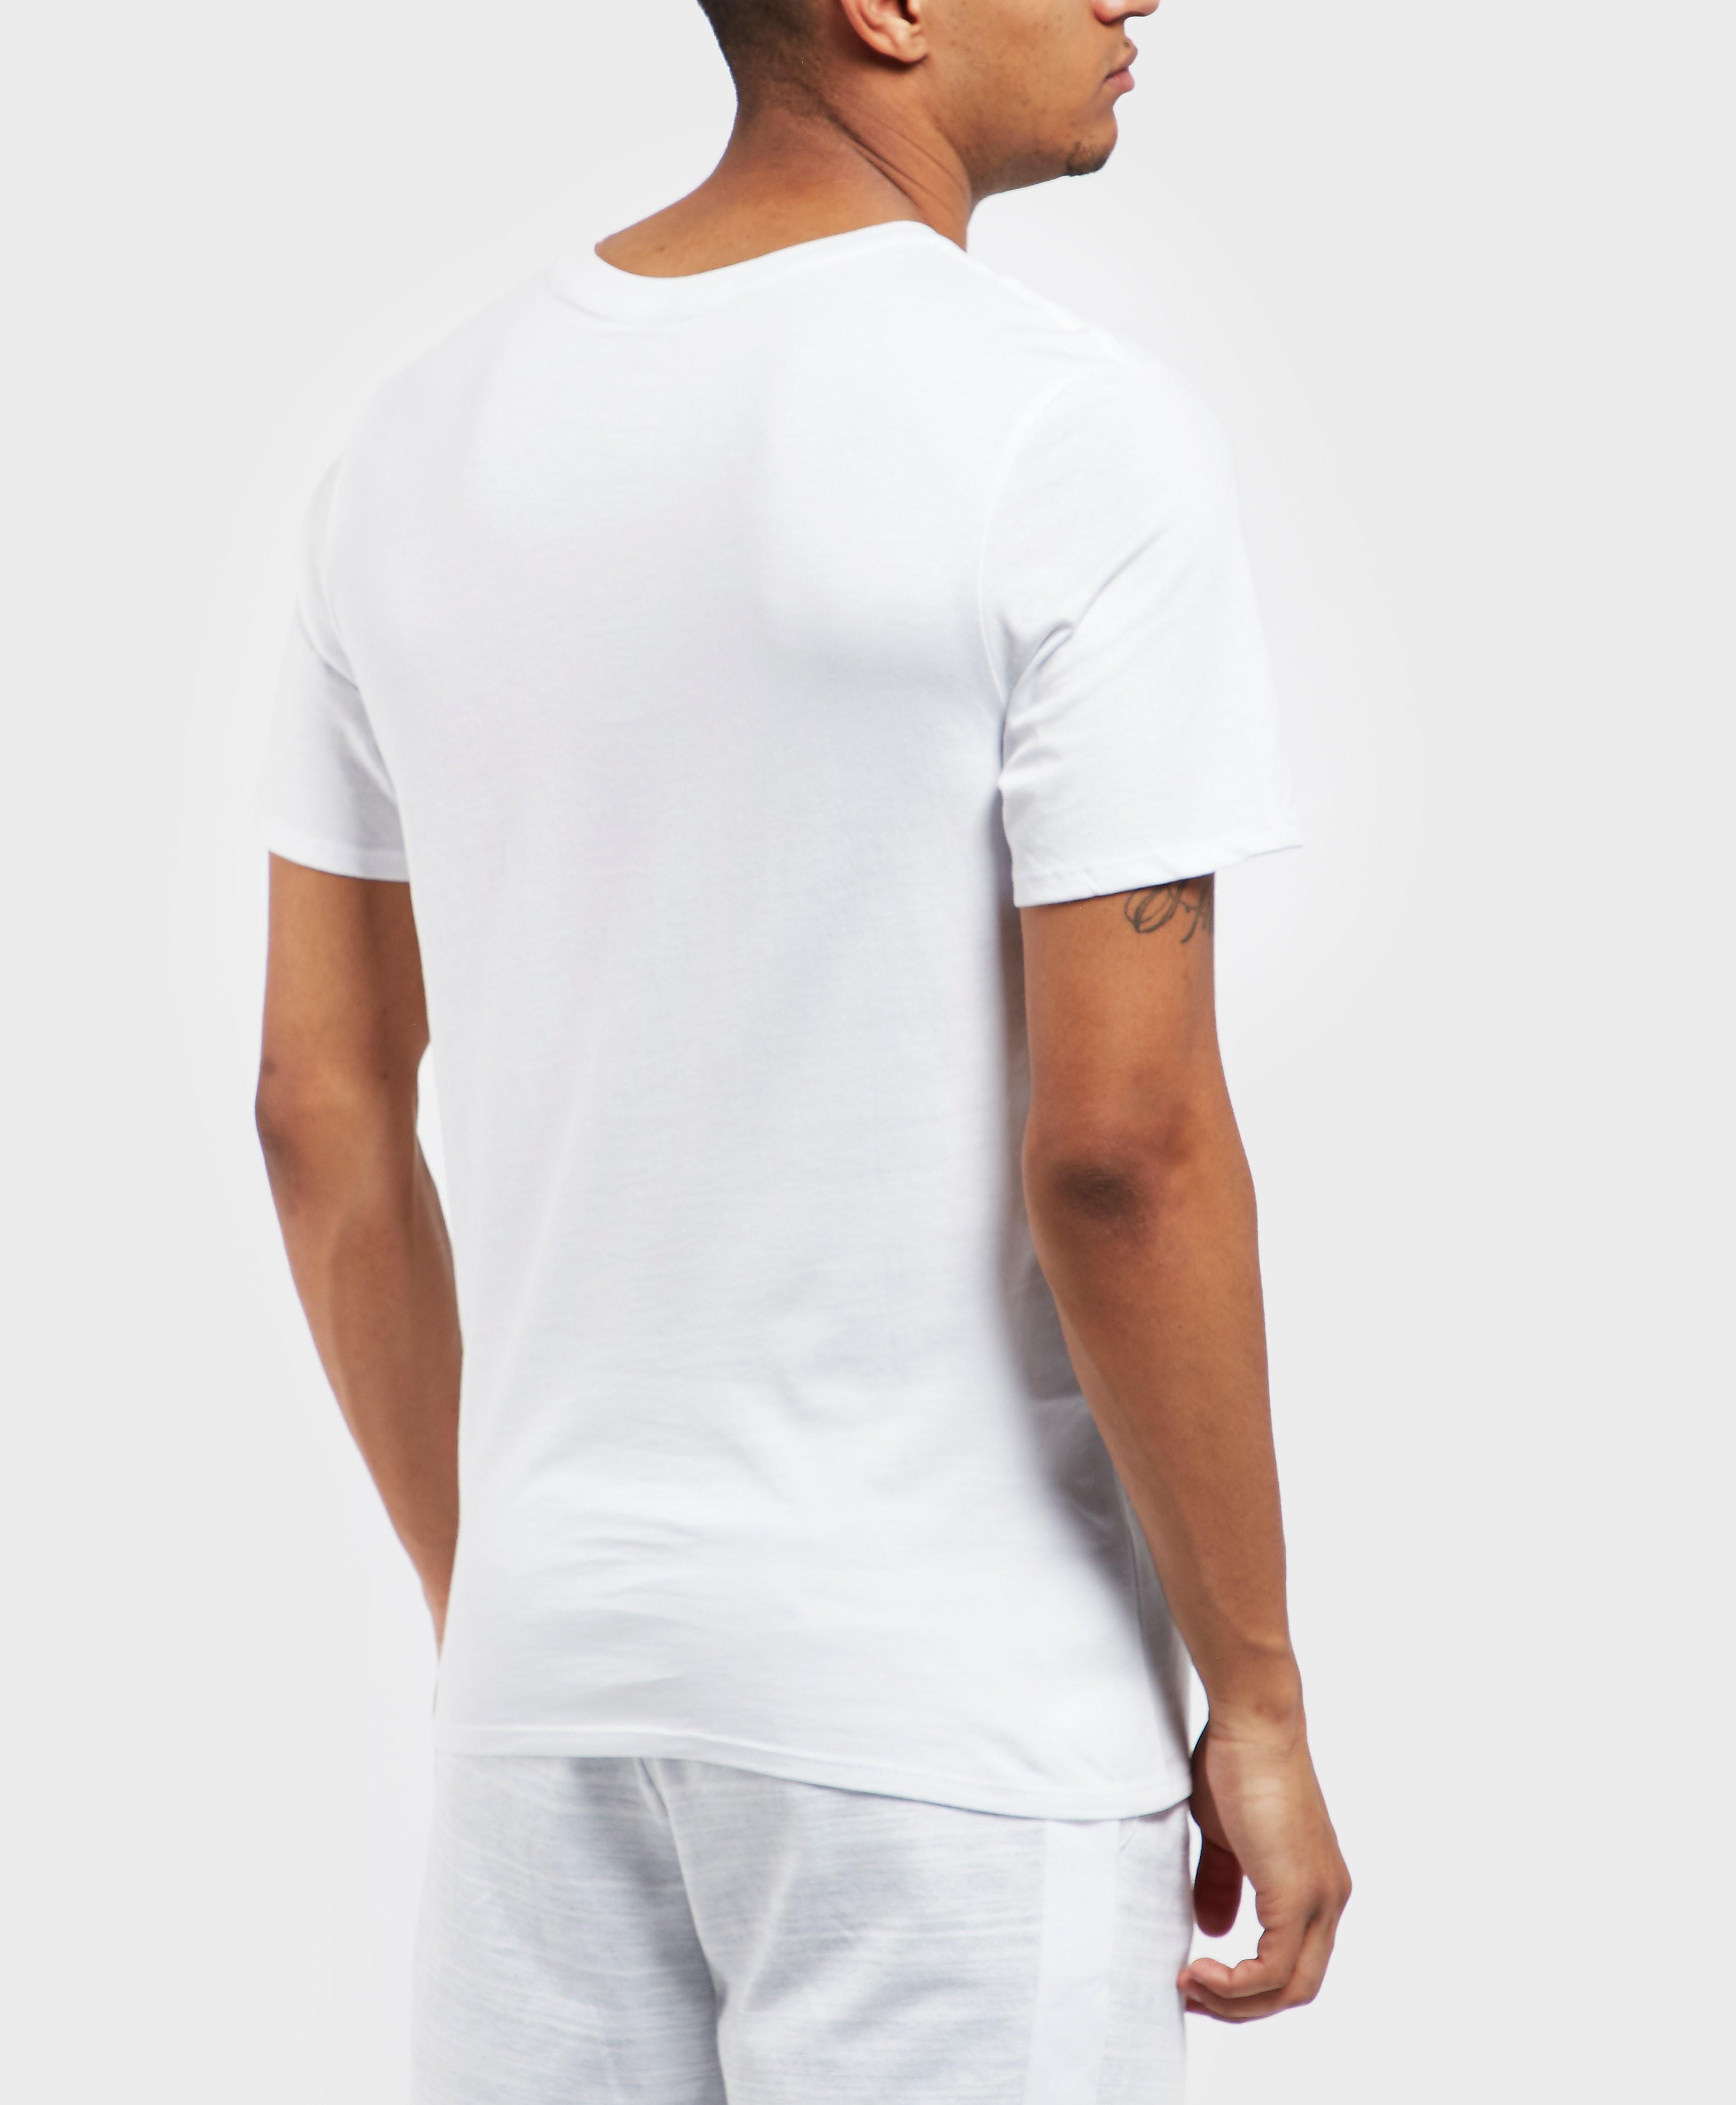 Nike Smile Swoosh Short Sleeve T-Shirt